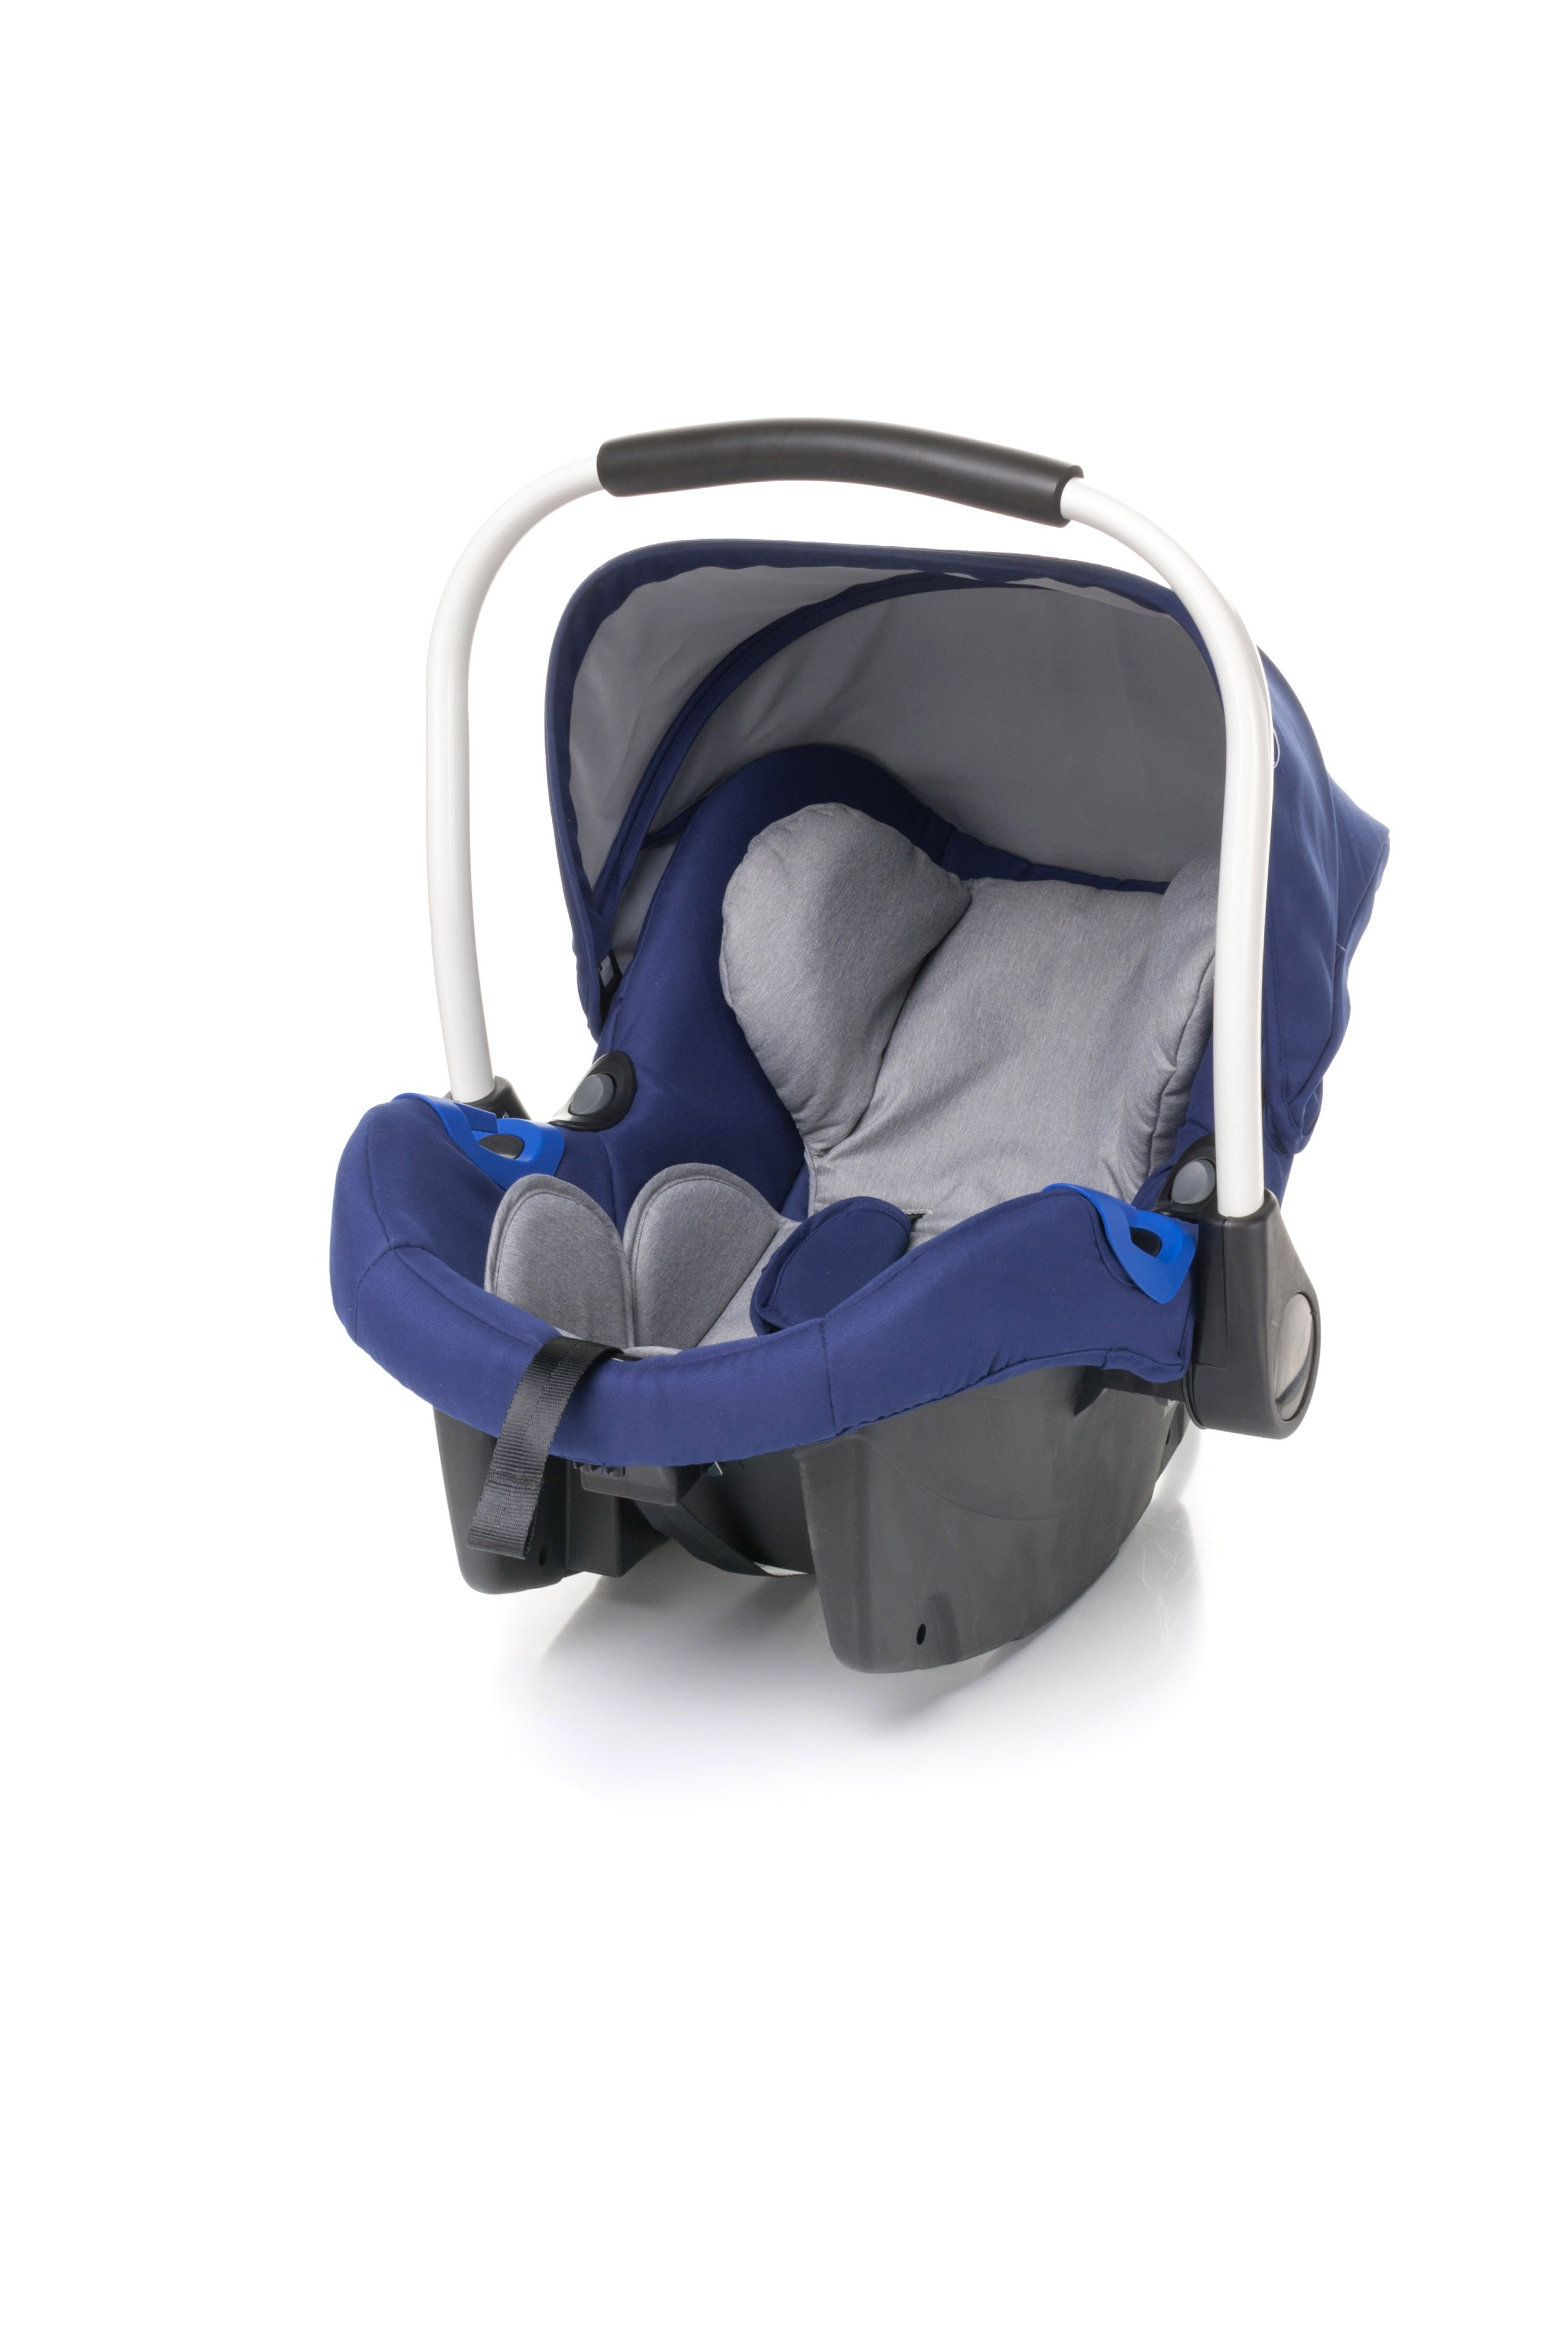 Bērnu autosēdeklis 0-13 kg 4BABY GALAX navy blue